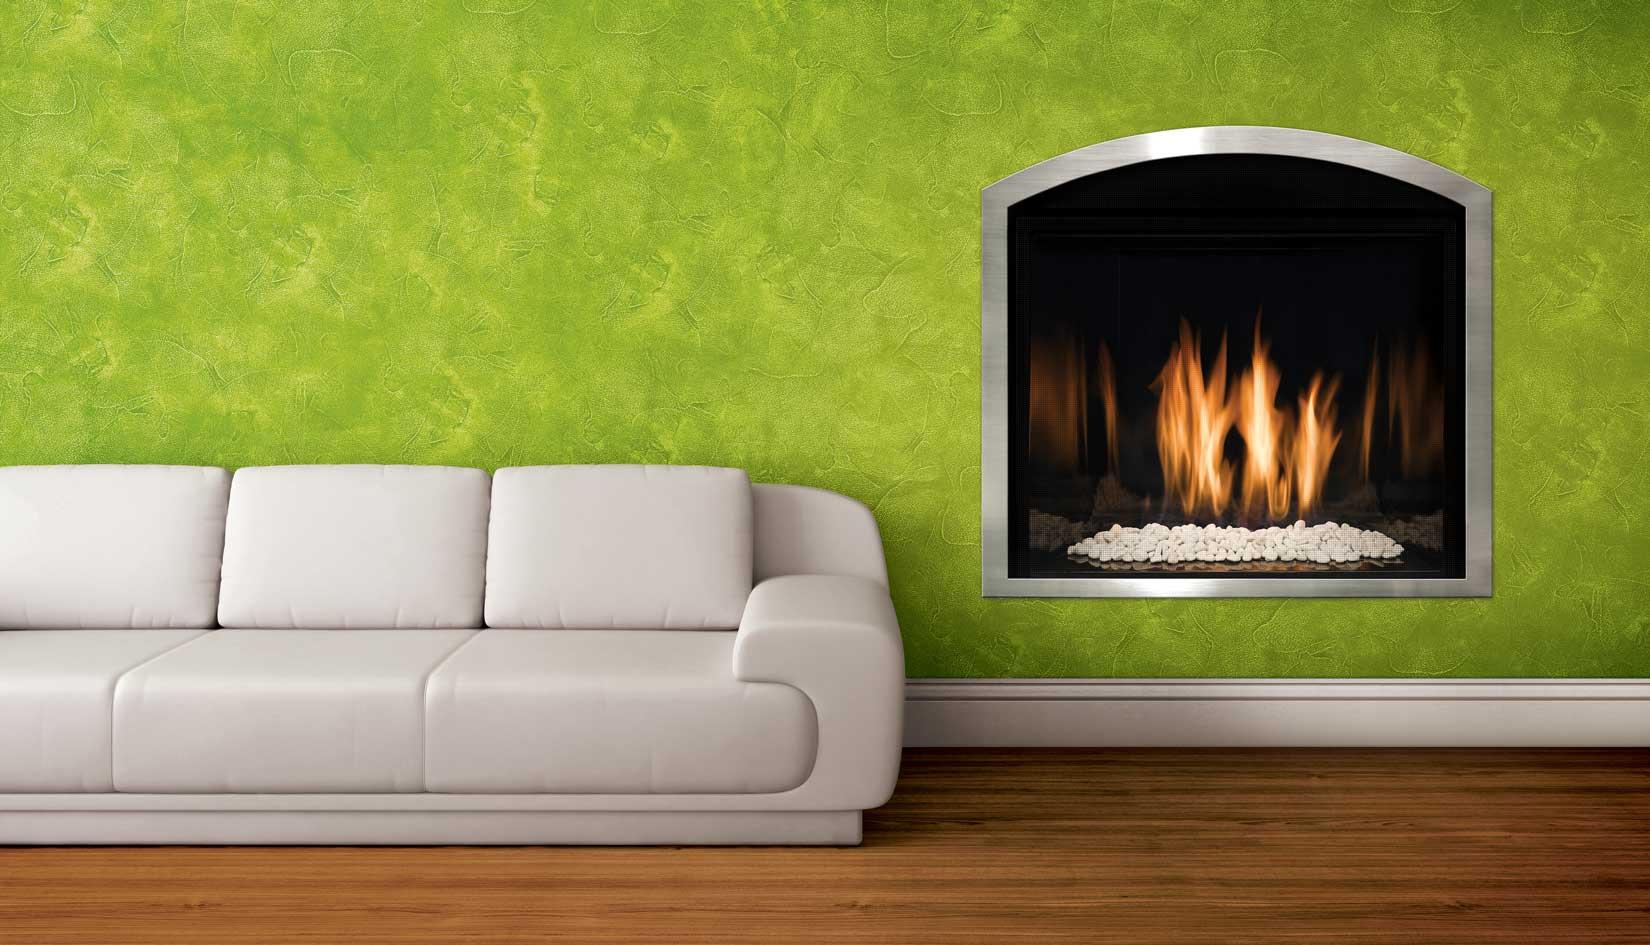 screens ventless screen modern for oven fireplace gas and windows doors florist curtain ideas insert target screensaver brick tile hold surround baskets electric mac dutch parquet